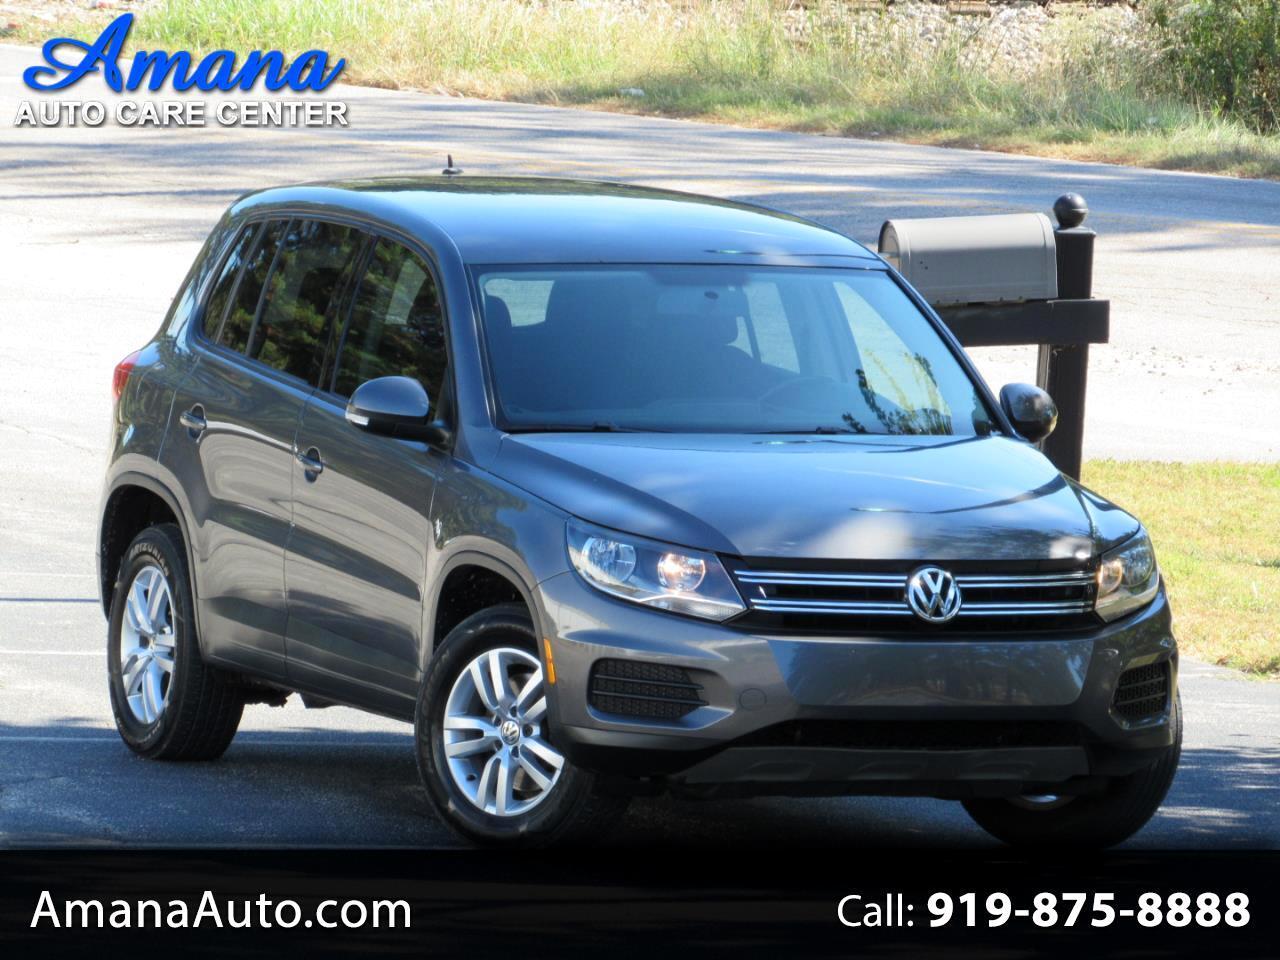 2014 Volkswagen Tiguan 4MOTION 4dr Auto S